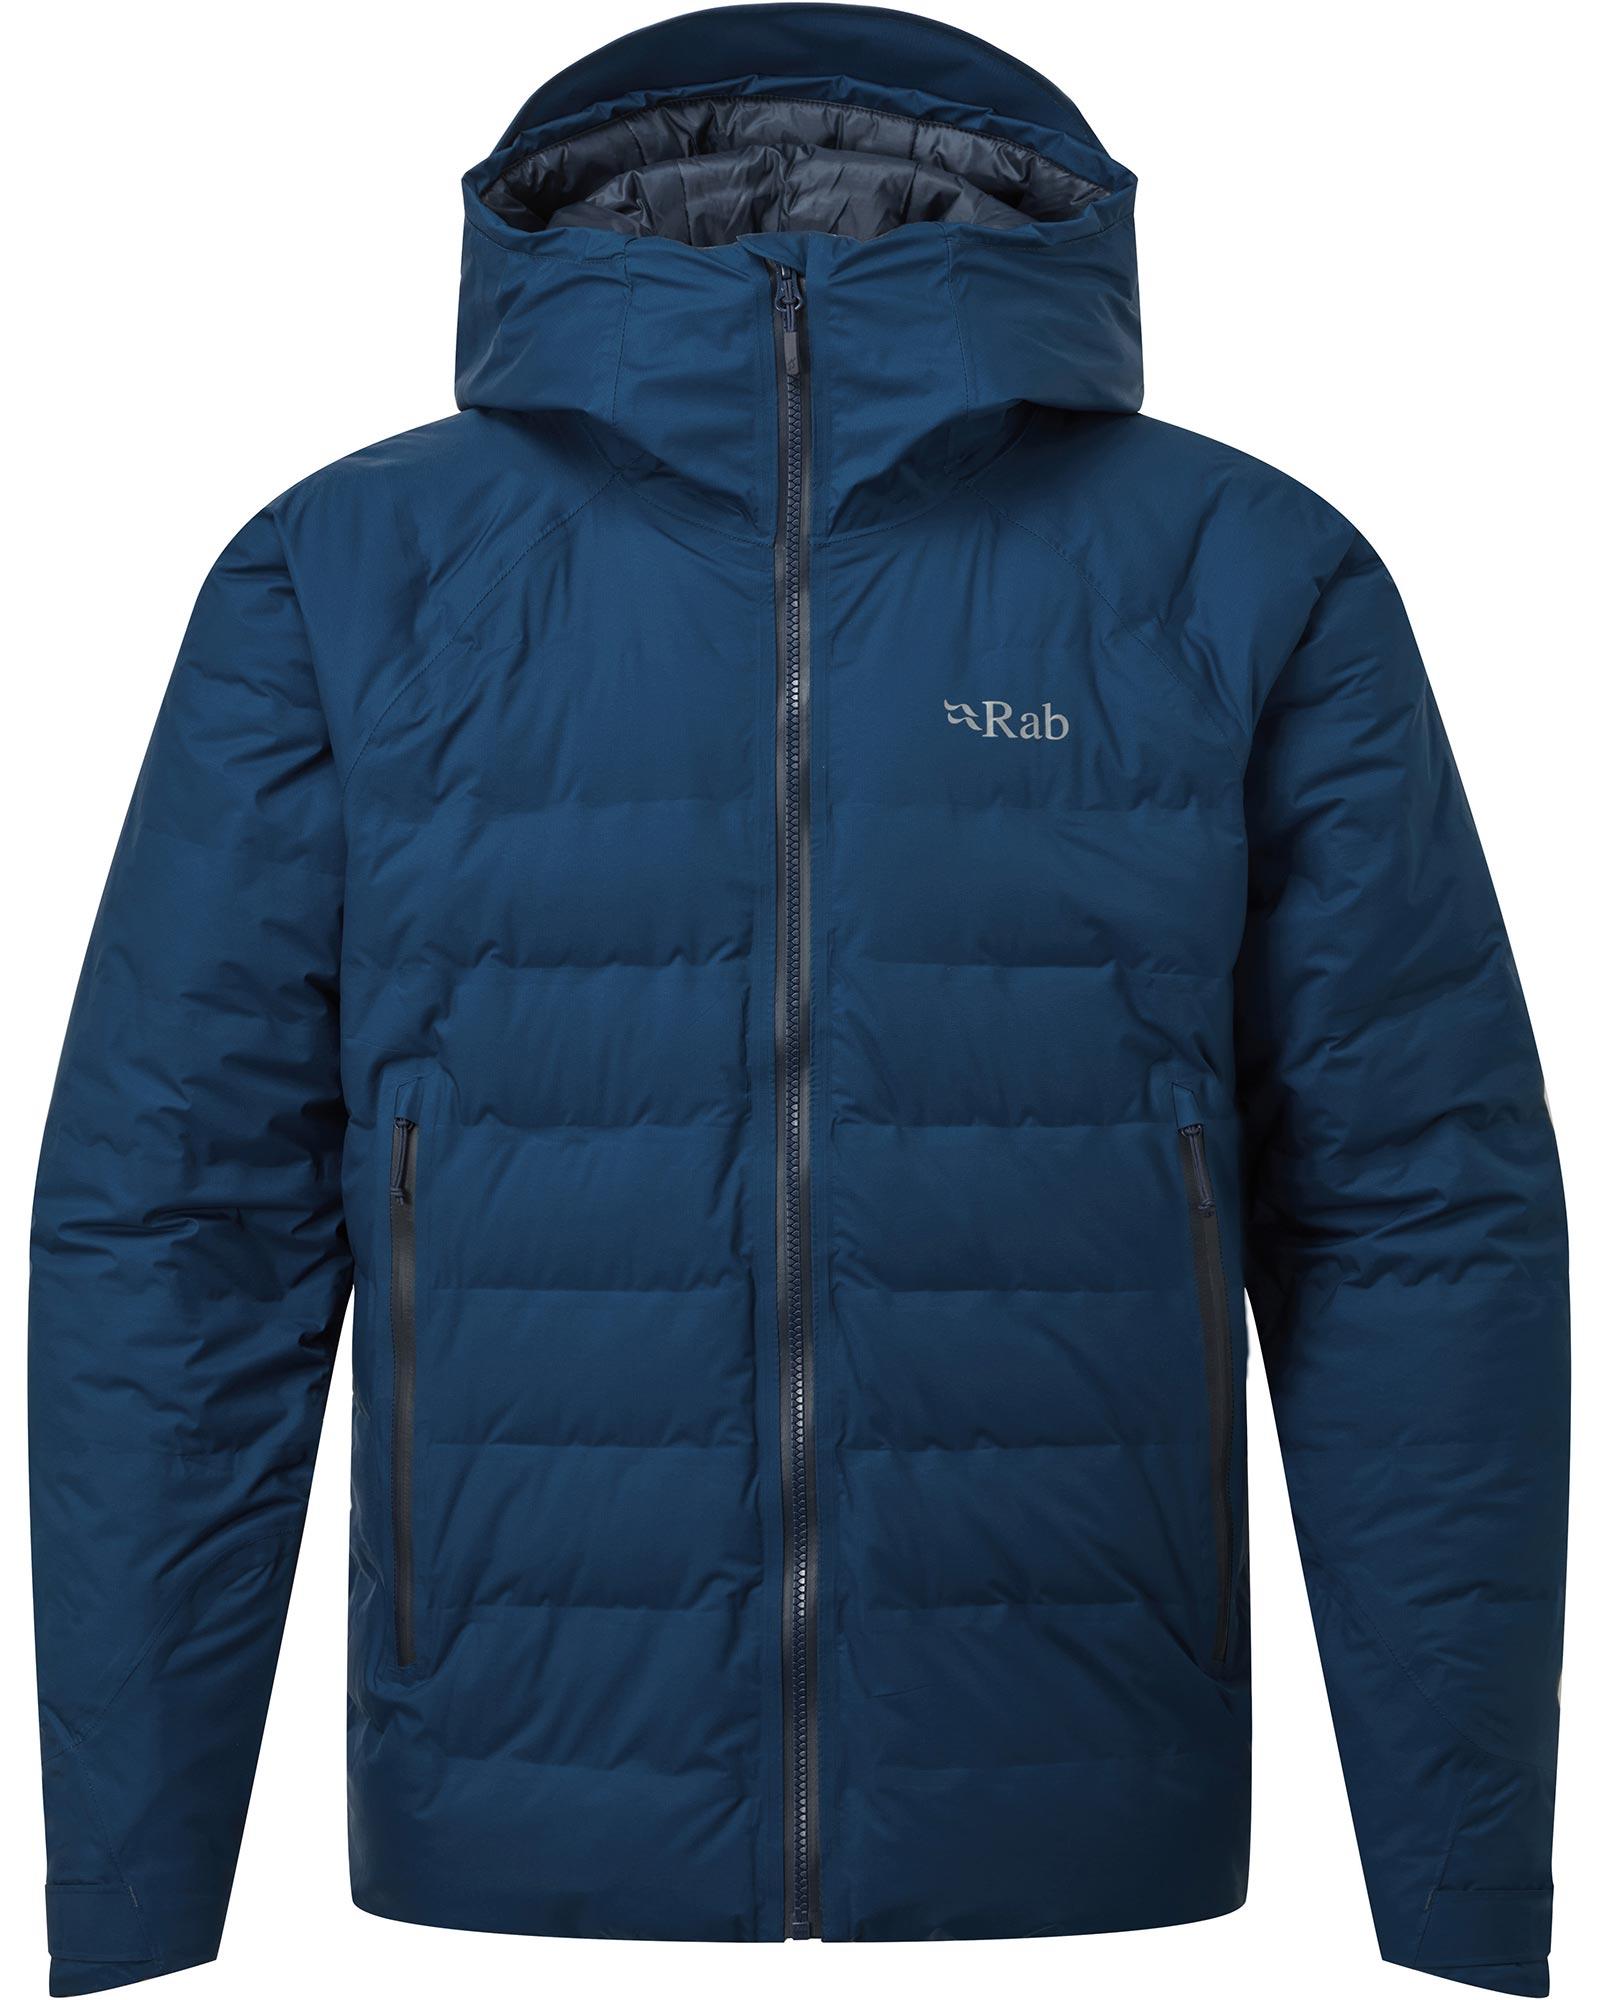 Rab Men's Valiance Jacket 0